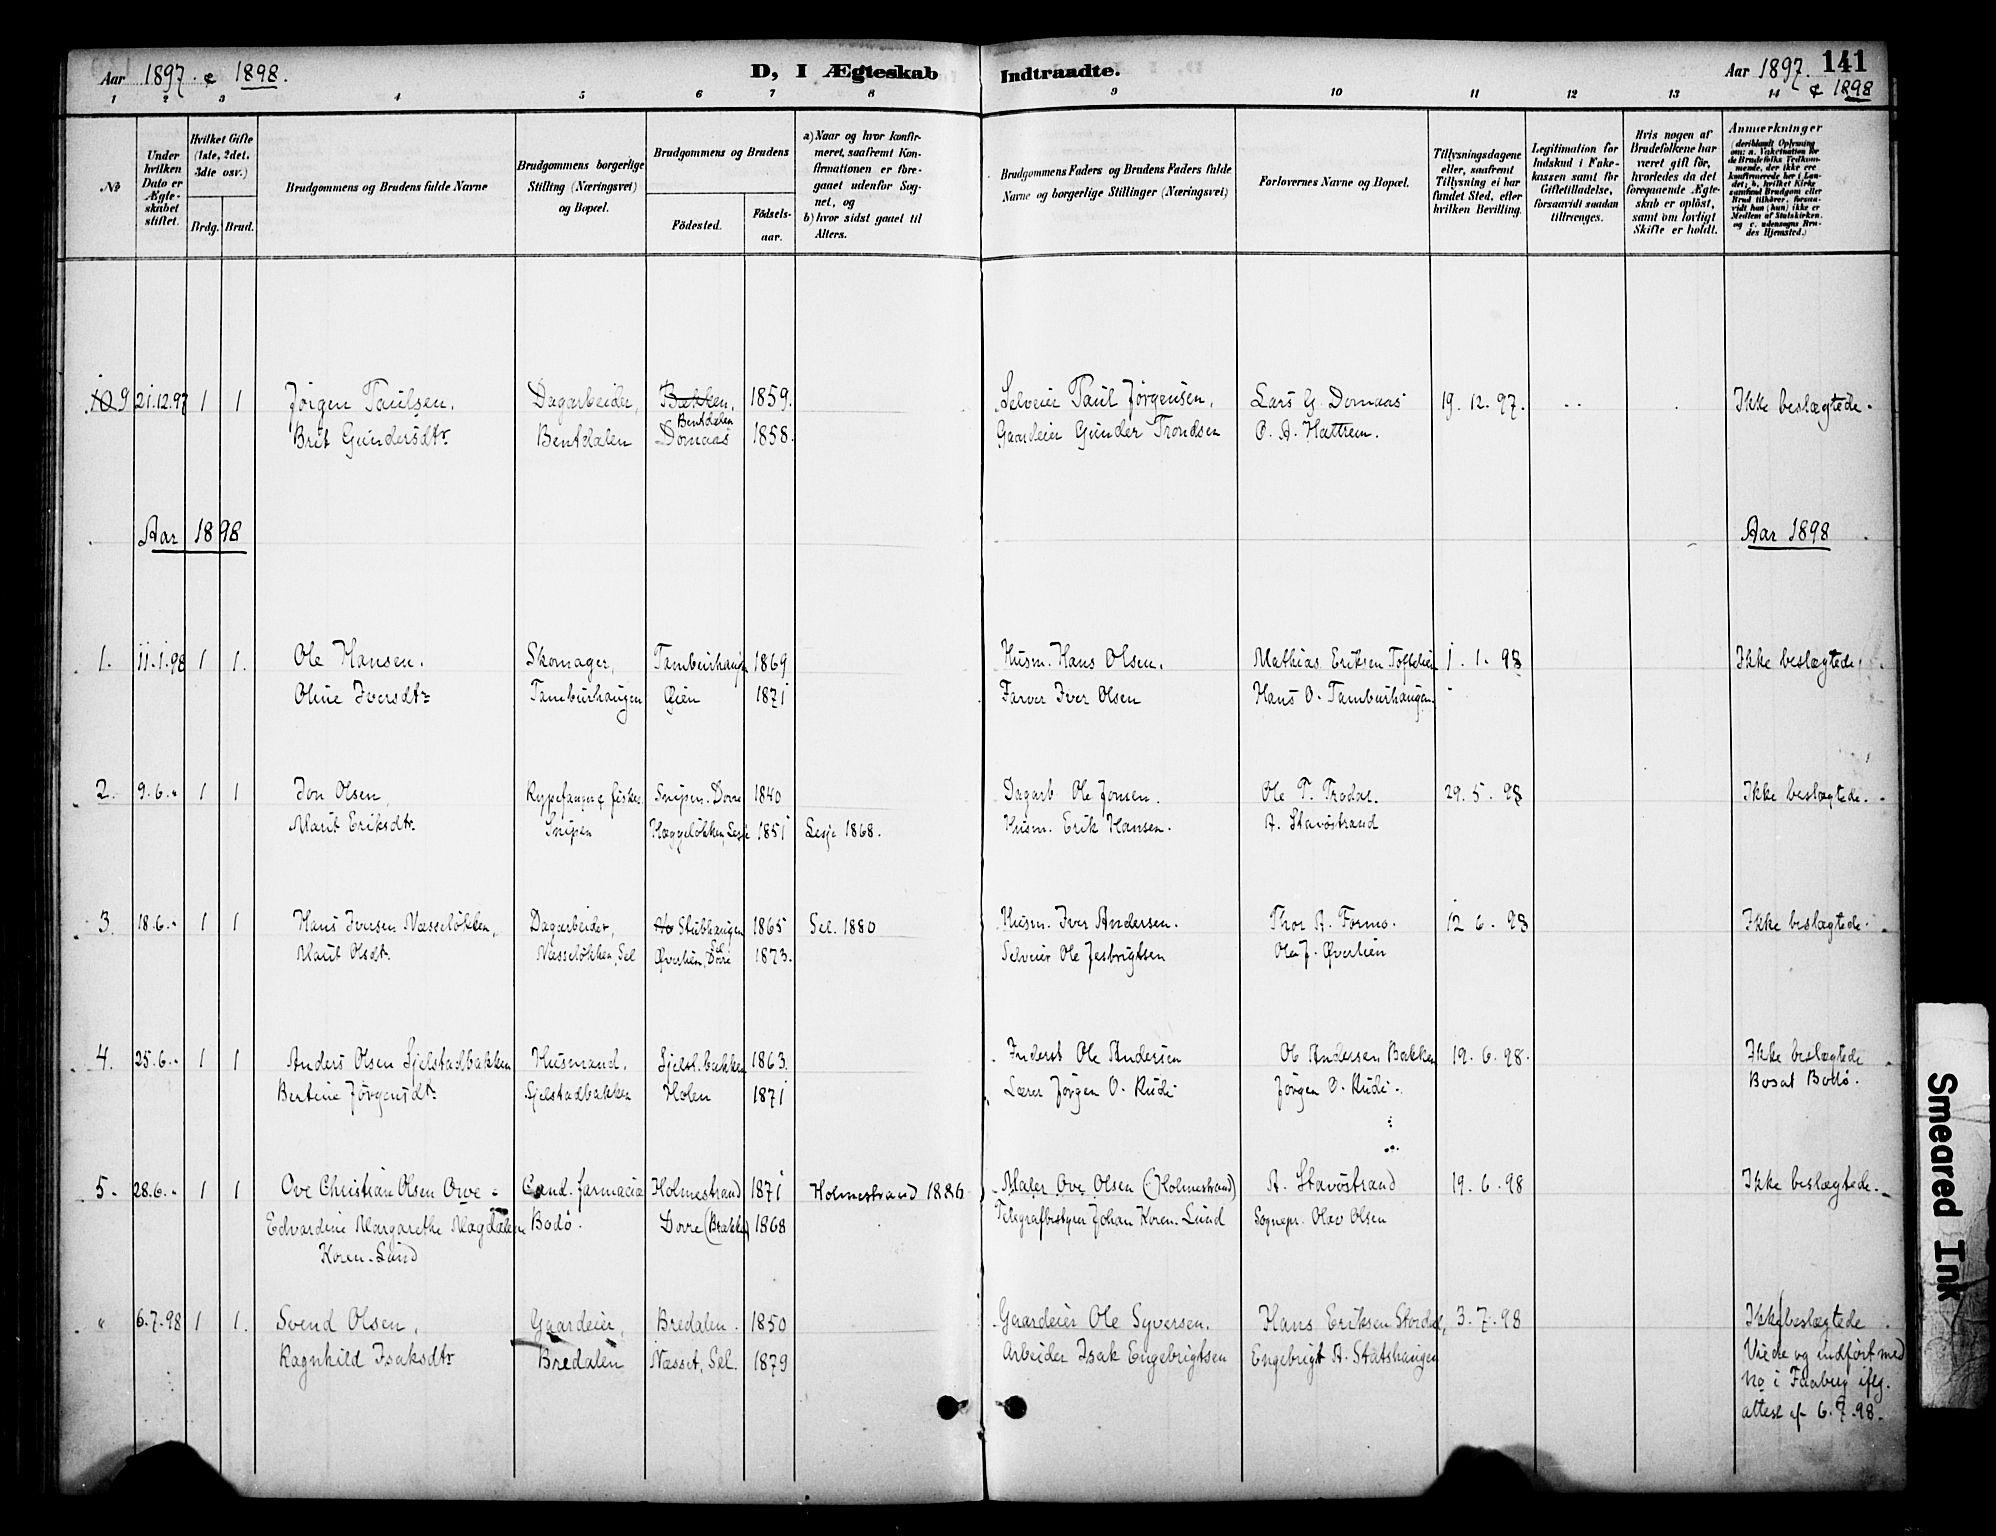 SAH, Dovre prestekontor, Ministerialbok nr. 3, 1891-1901, s. 141